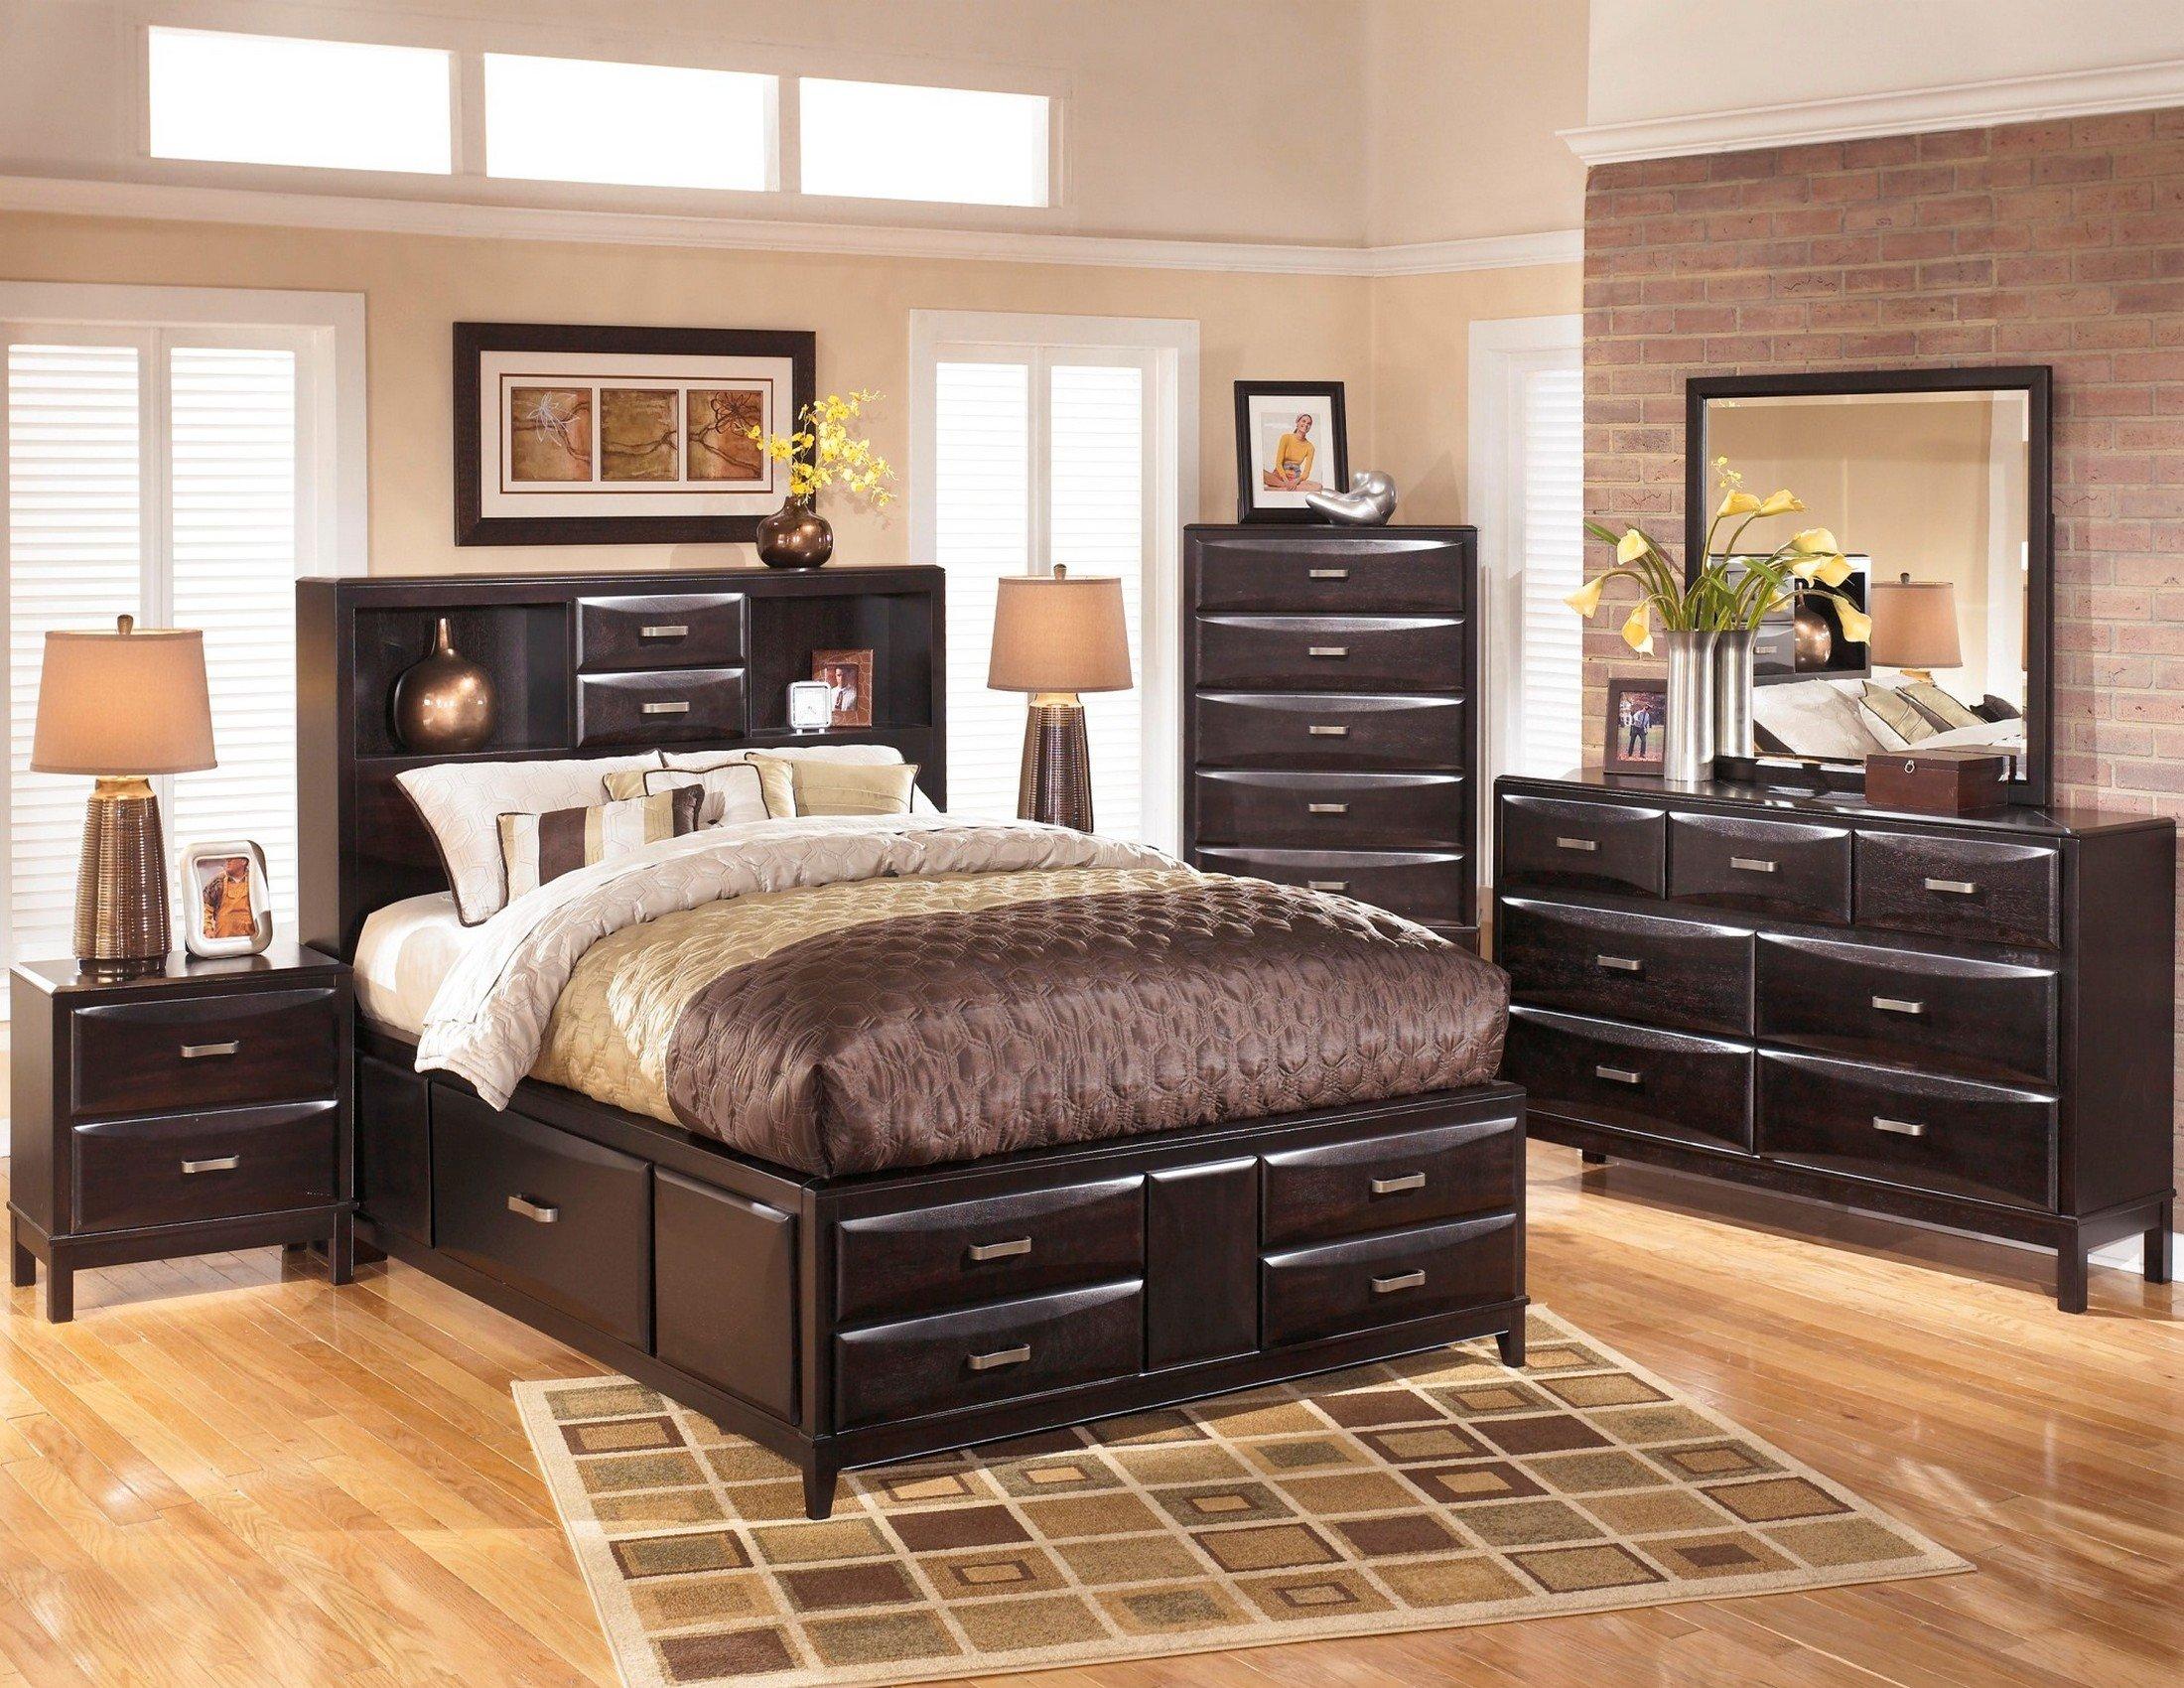 Ashley Catalina Bedroom Set New Kira Storage Platform Bedroom Set From ashley B473 64 65 98